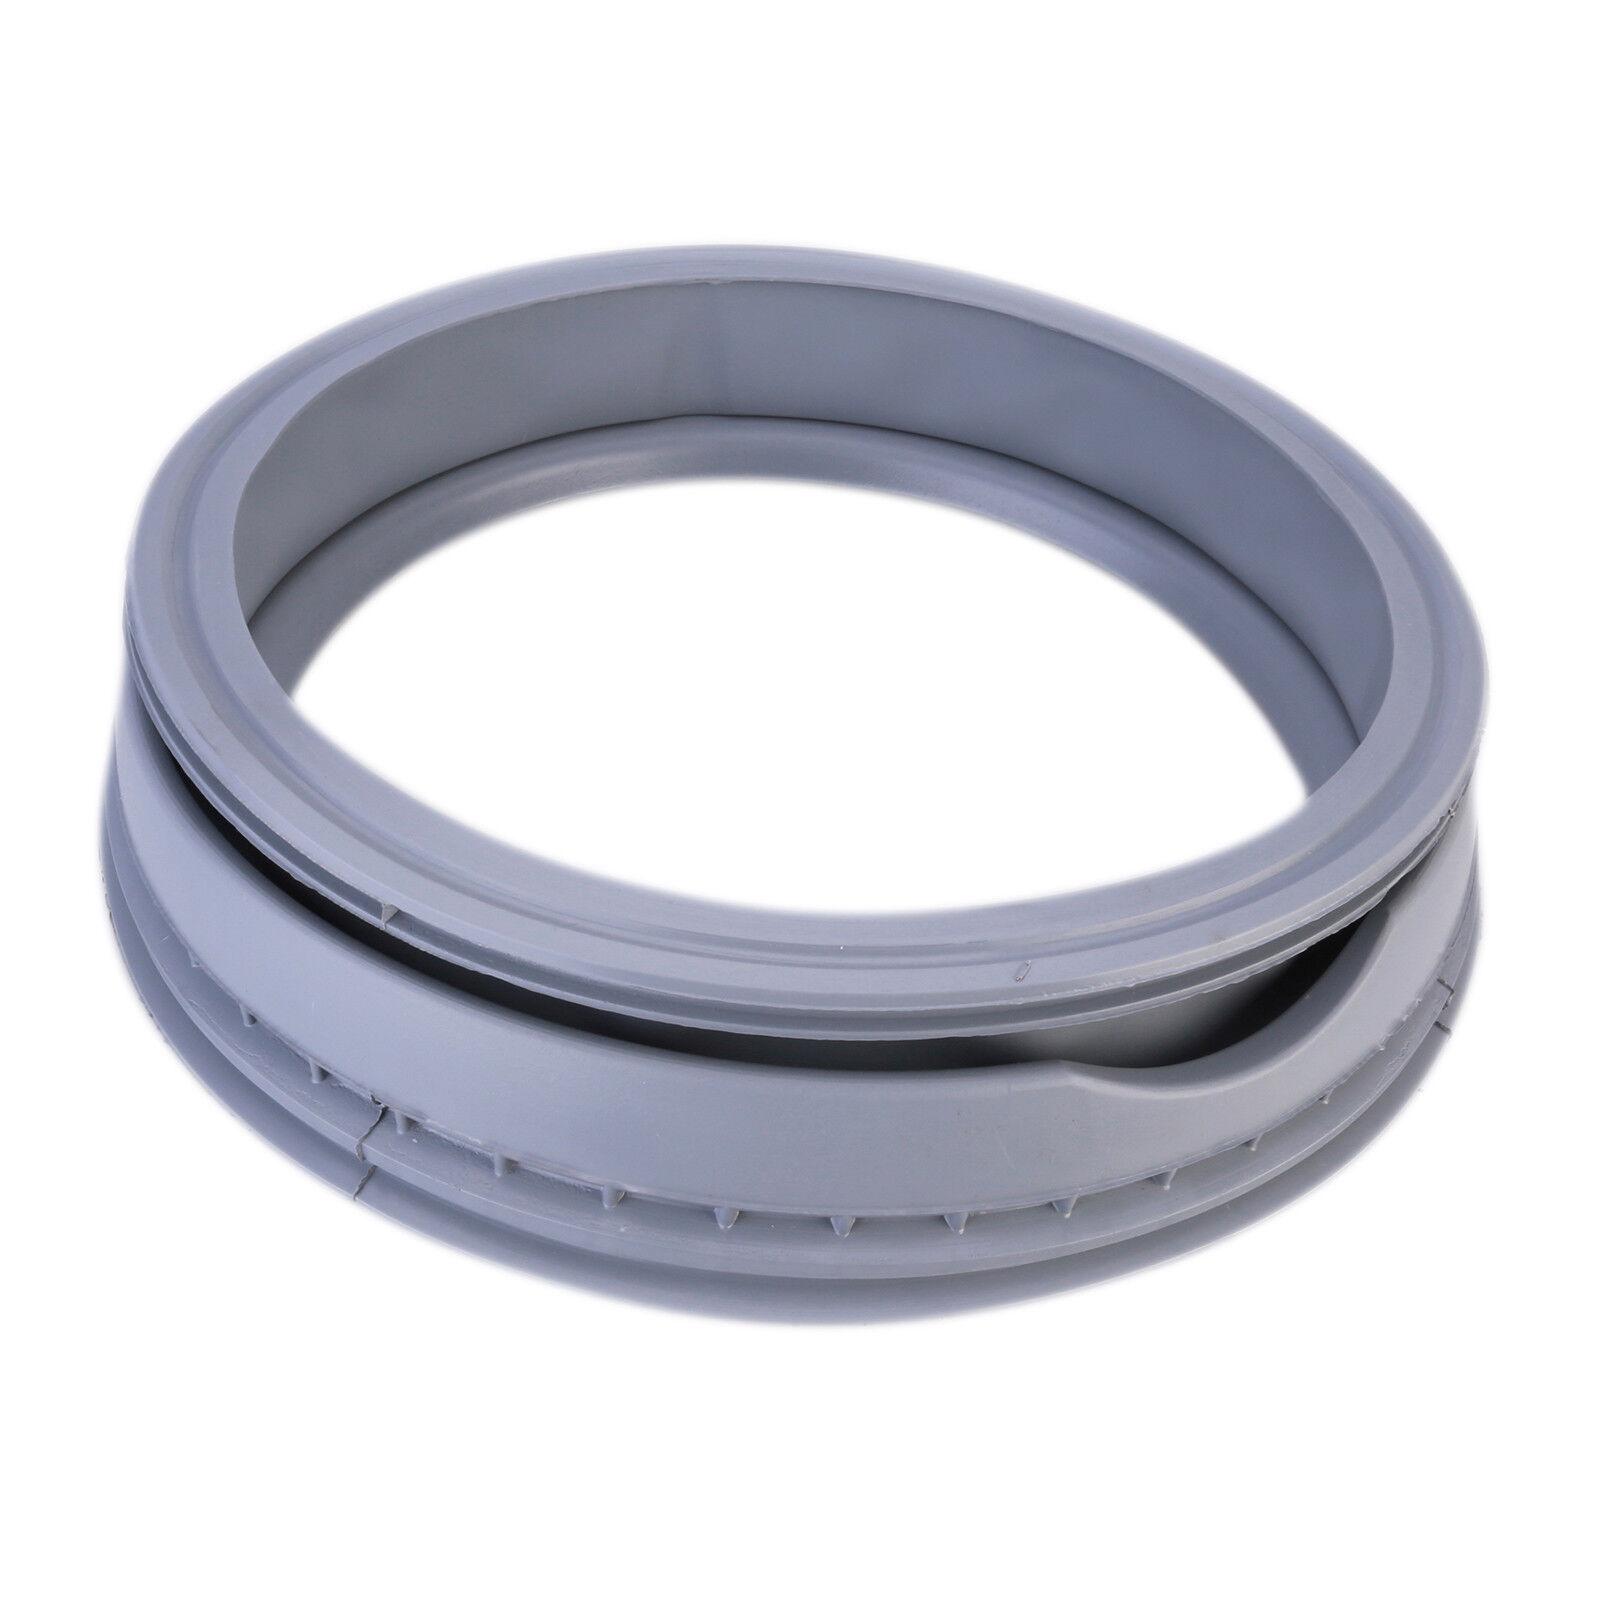 For Bosch WFL2481//01 Washing Machine Door Seal